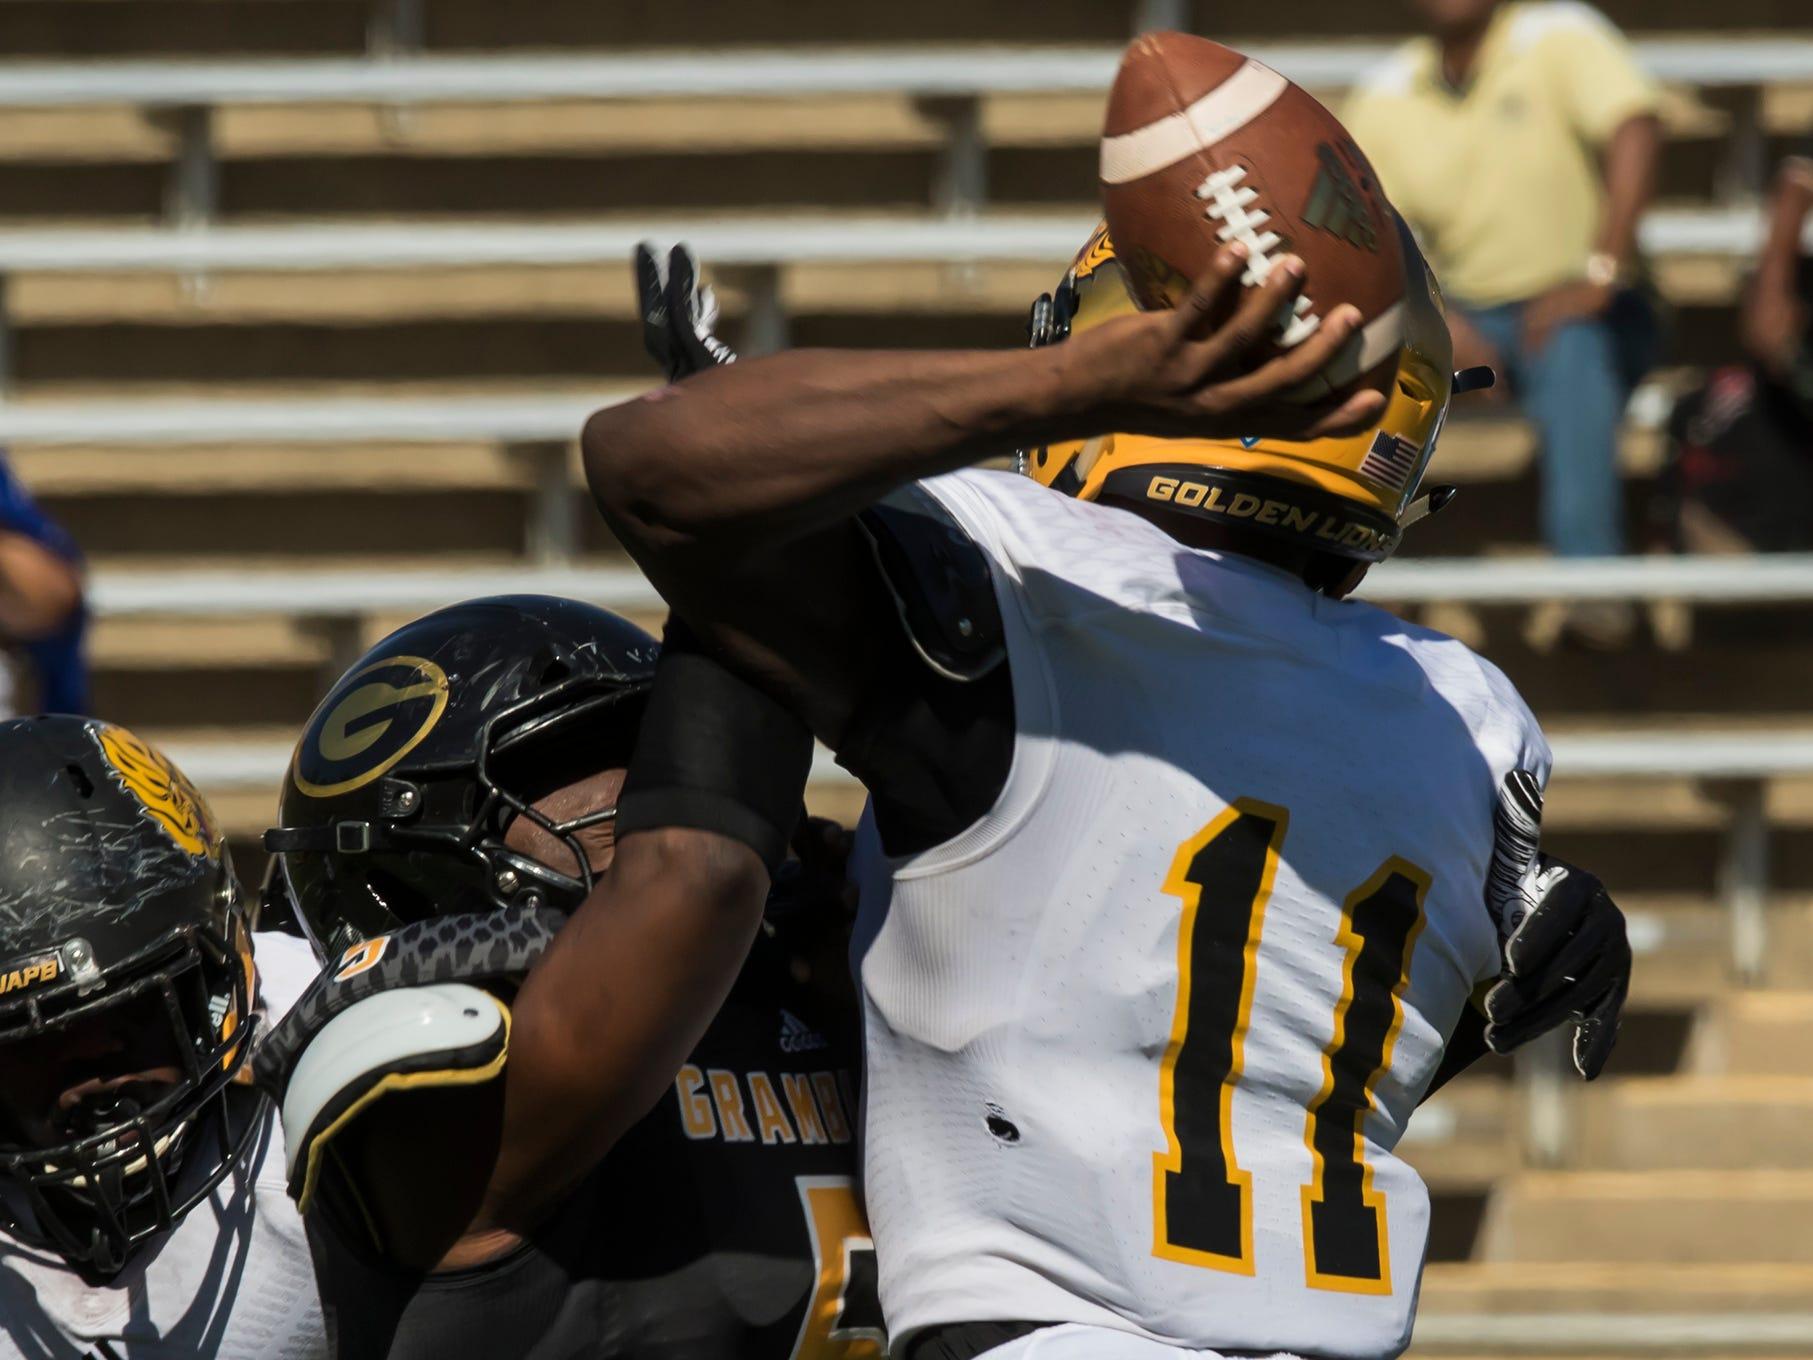 Grambling won 45-38 in a thrilling overtime winner against University of Arkansas Pine-Bluff at Eddie G. Robinson Memorial Stadium at Grambling State University in Grambling, La. on Oct. 27